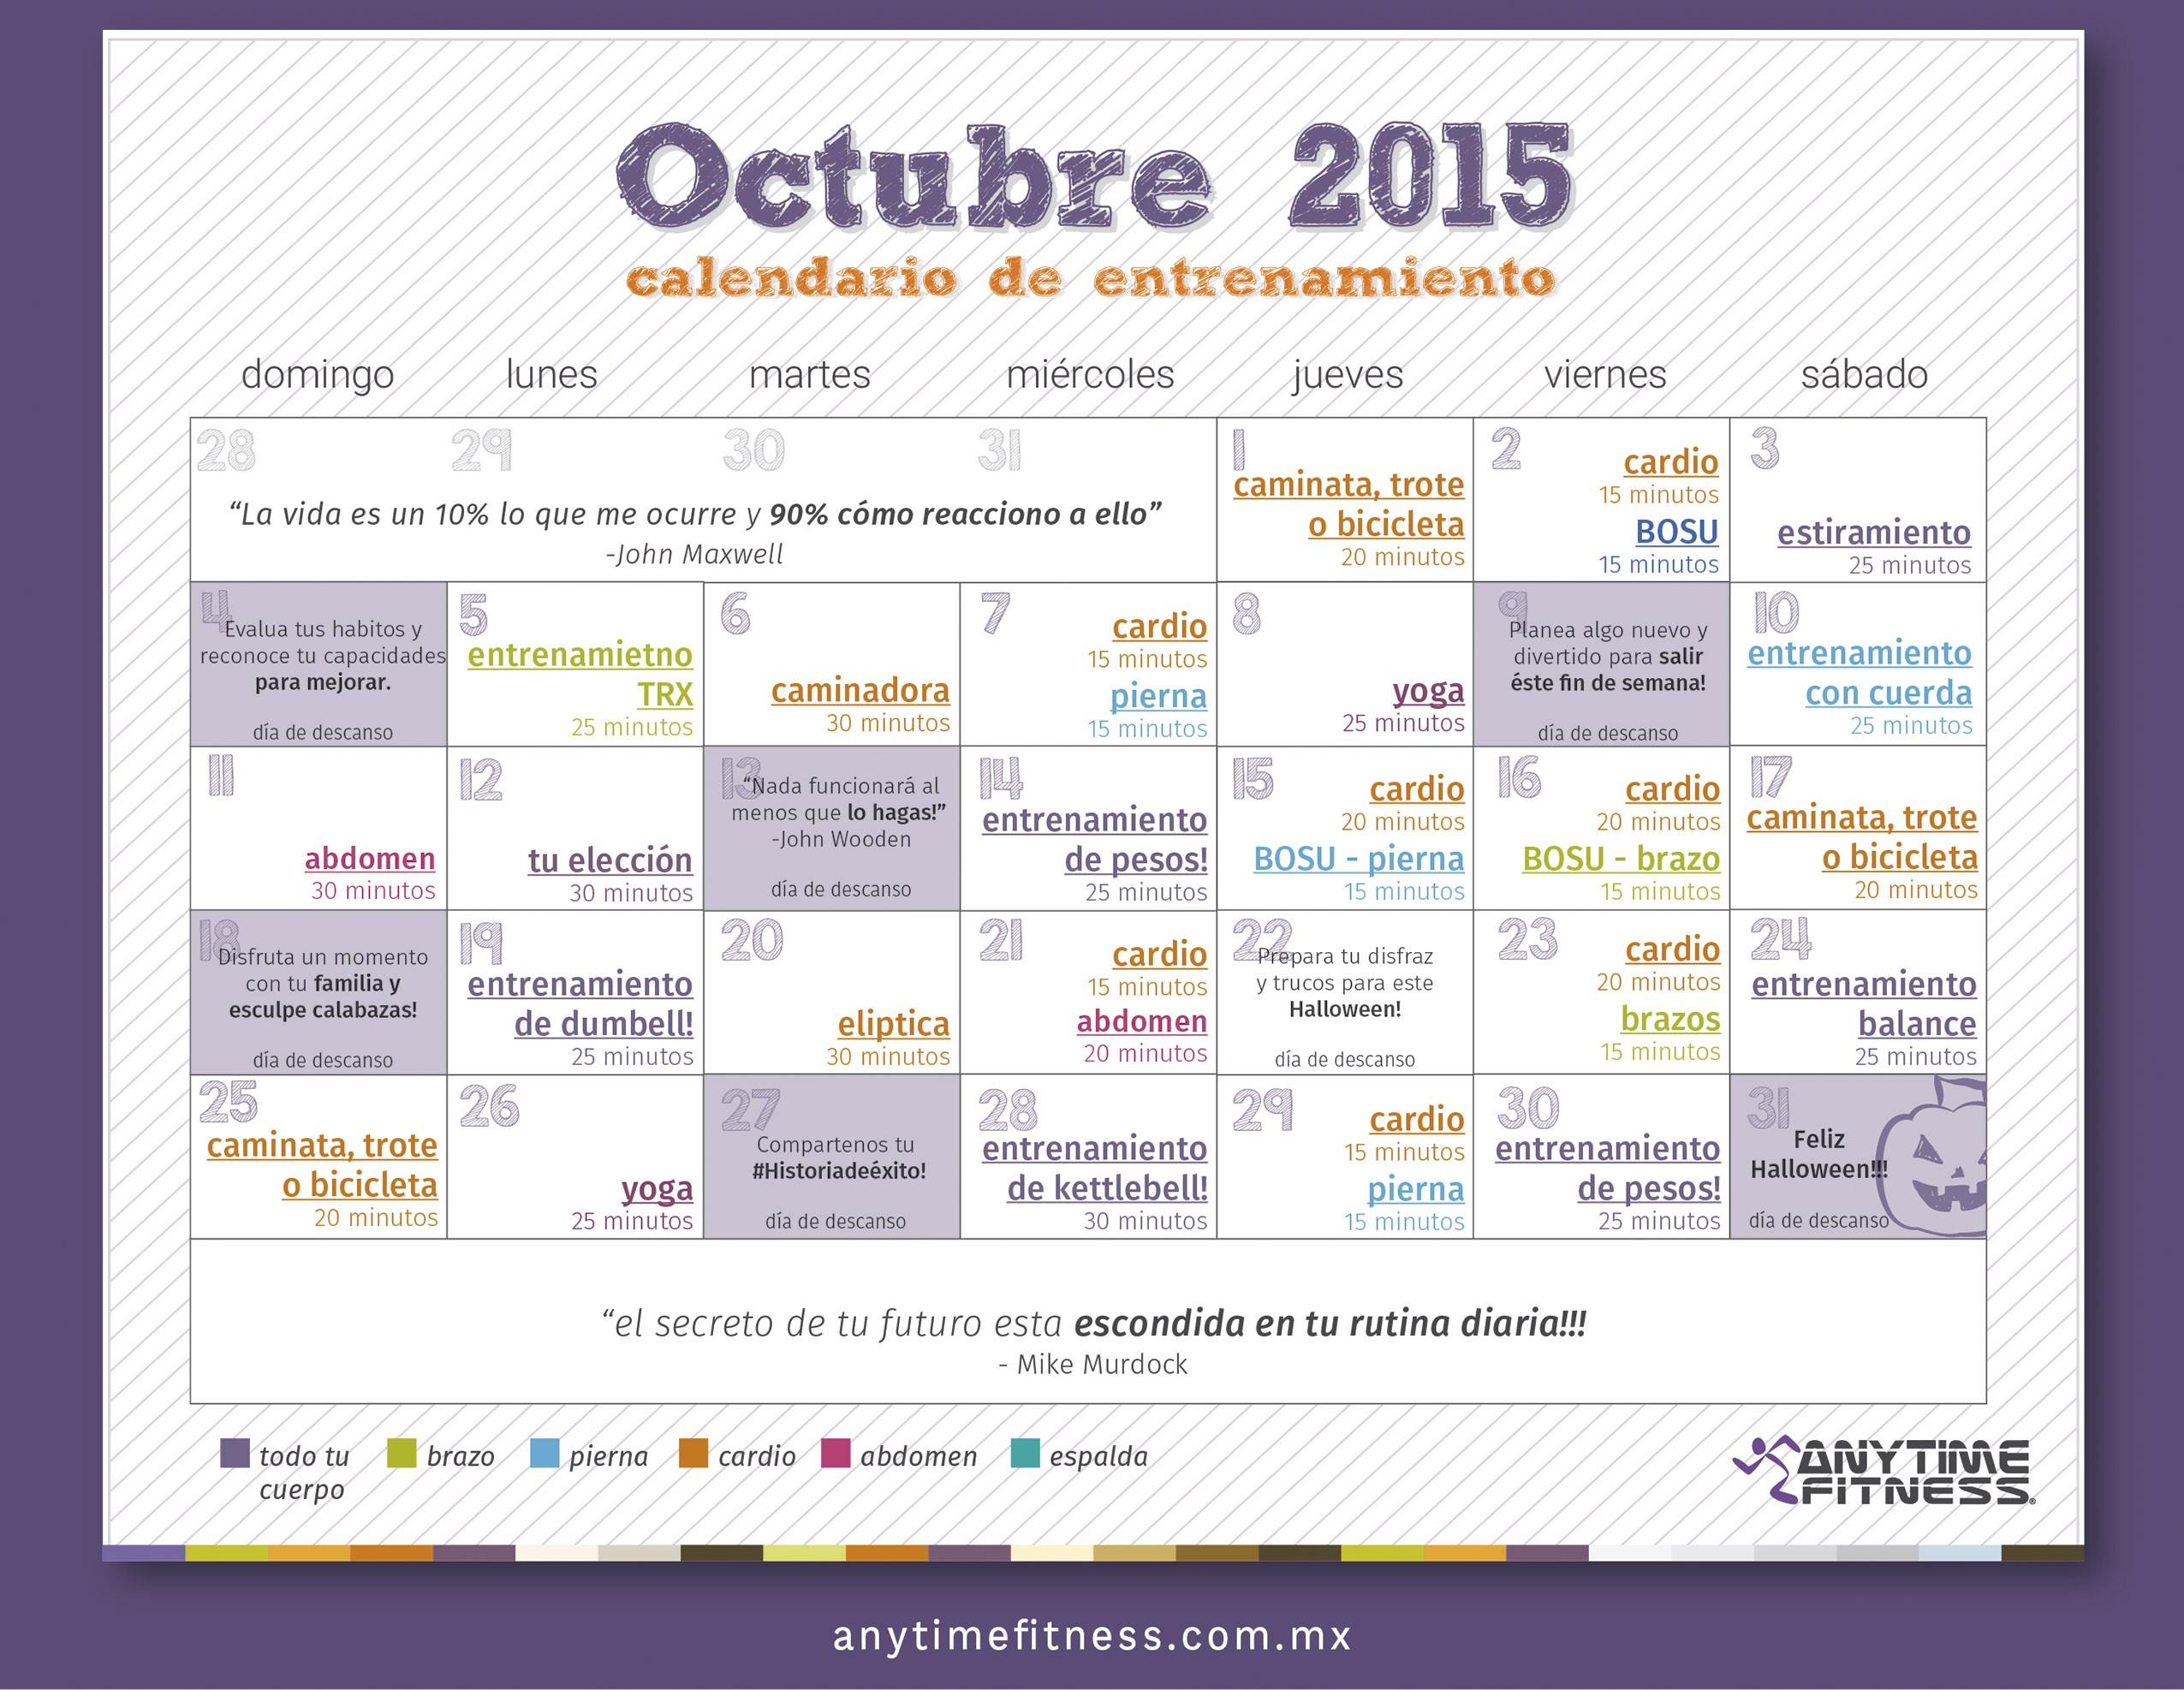 octubre calendario2015 2